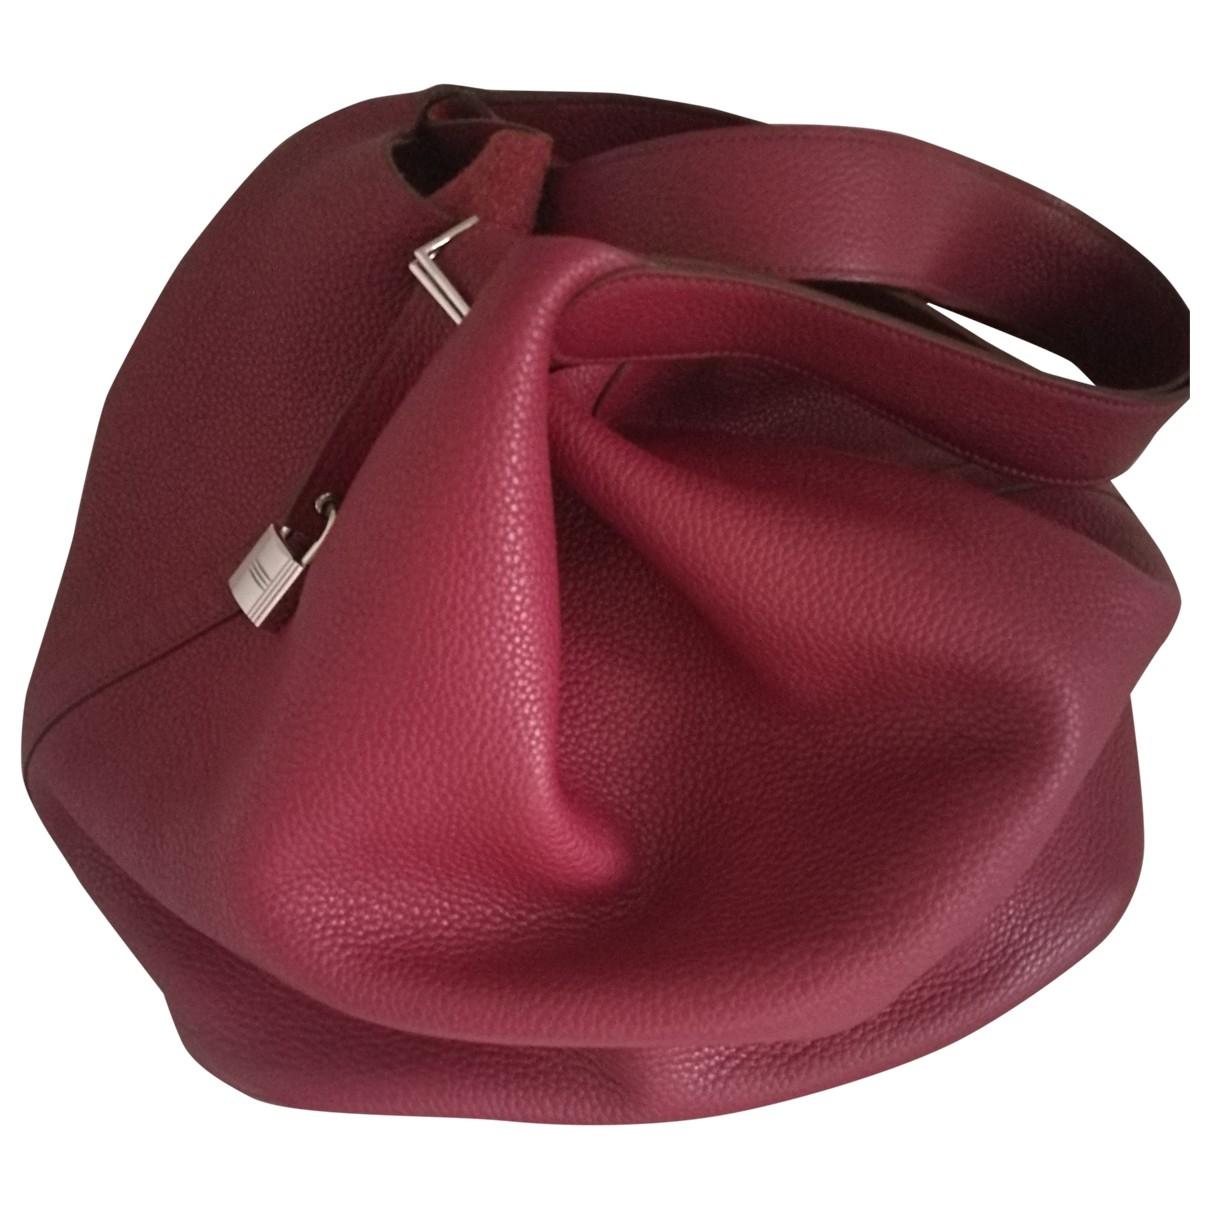 Hermes Picotin Handtasche in  Bordeauxrot Leder